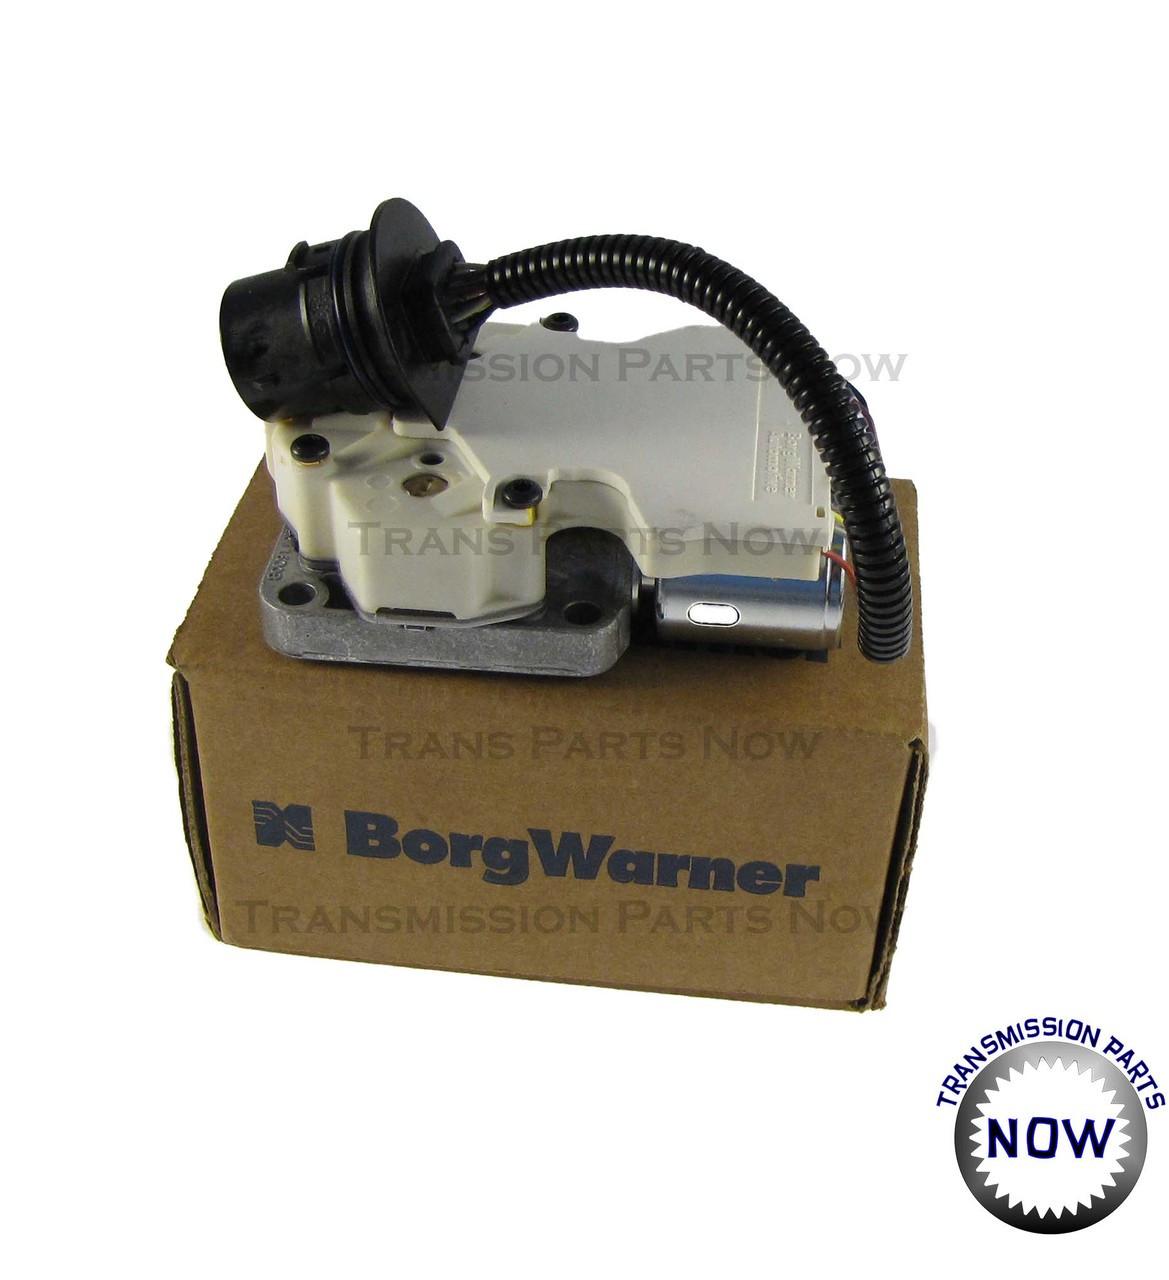 Borg Warner CD4E Solenoid block, Borg Warner CD4E Solenoid pack, 50082, 96420A, Solenoid pack, Transmission solenoid, CD4E, Escape, transmission parts